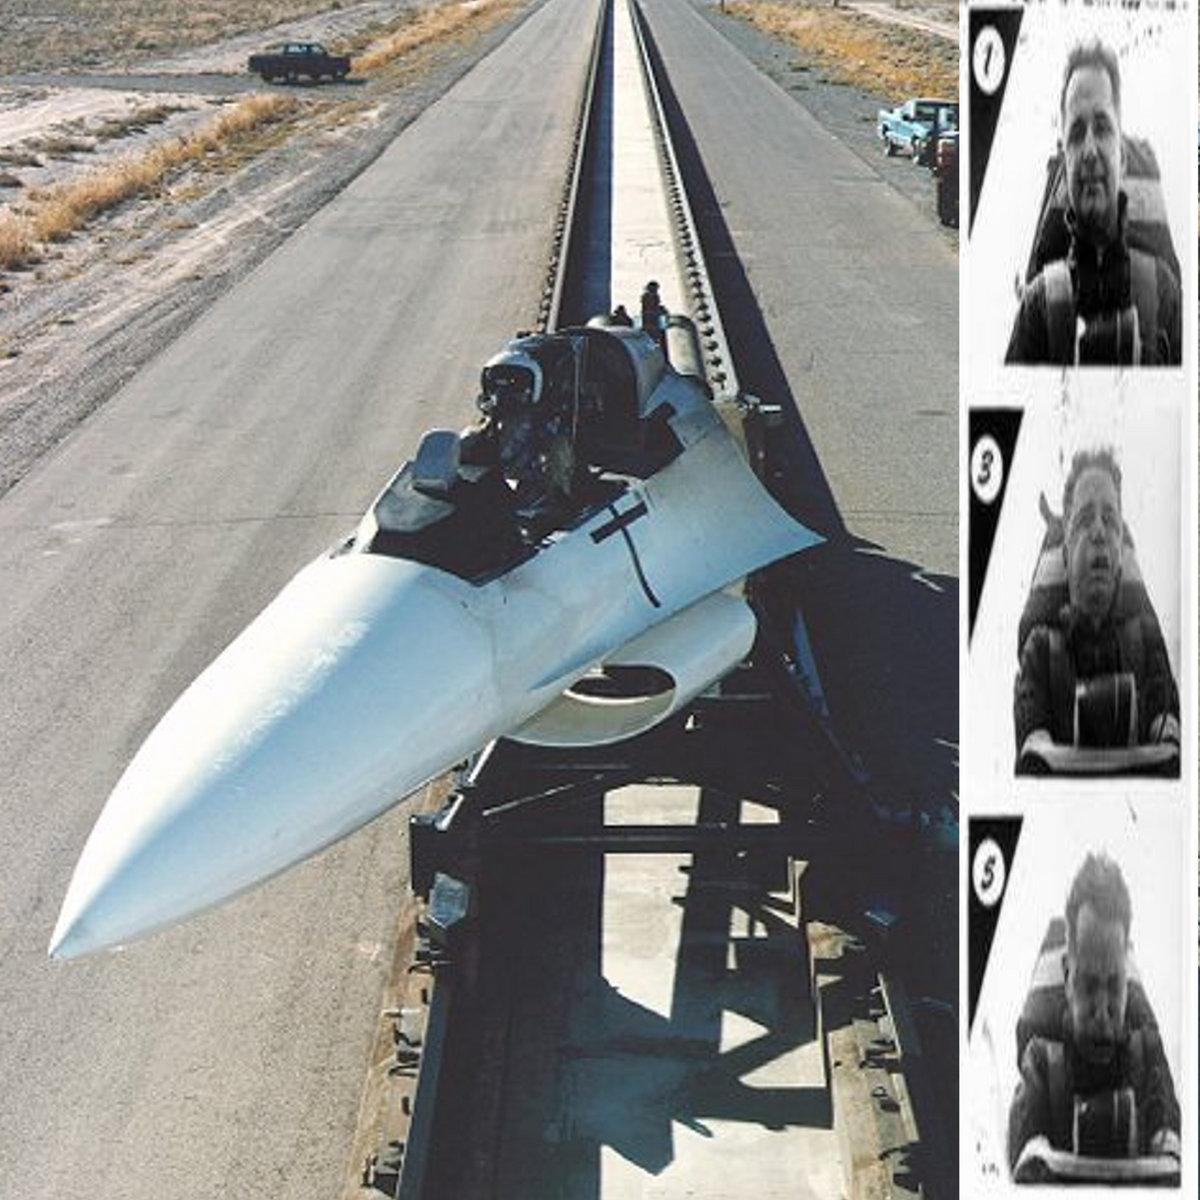 Rocket Sled | Mark James Murphy